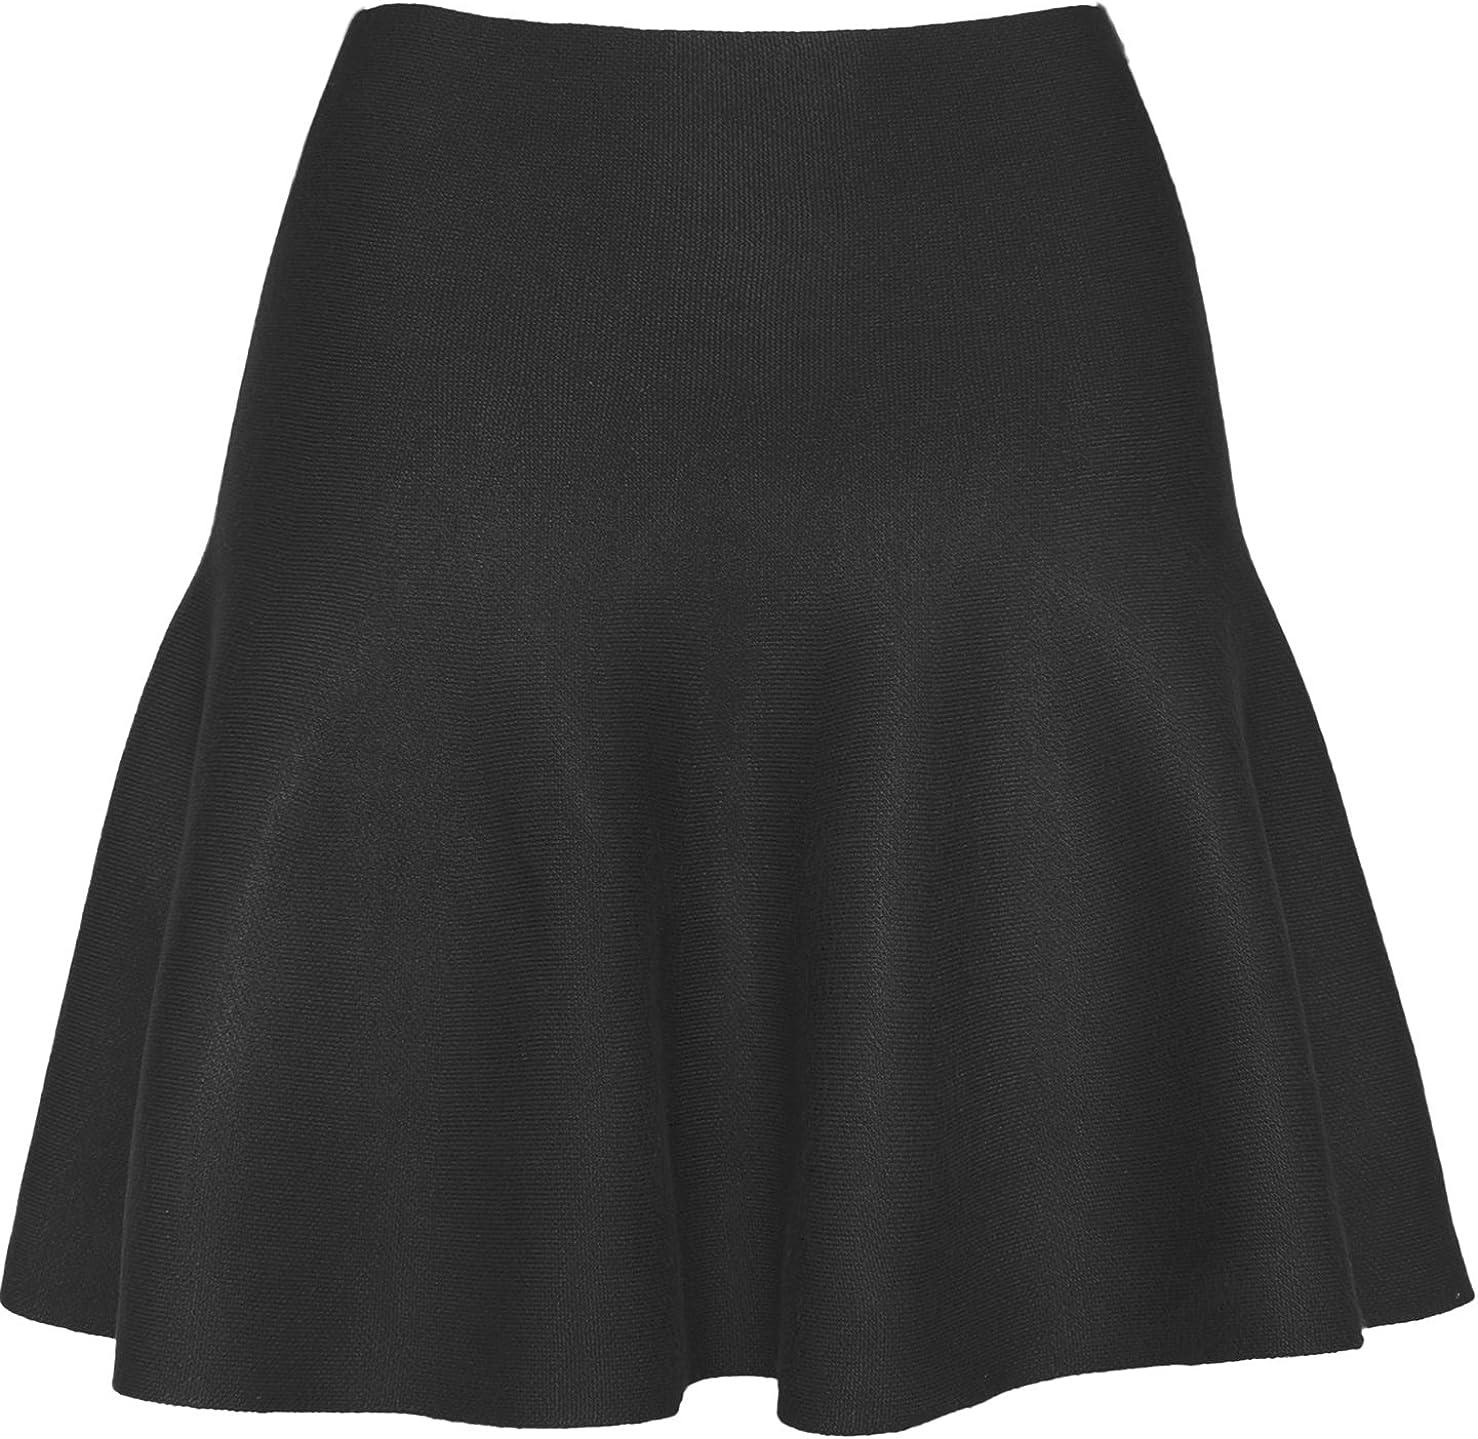 KMystic Womens Basic Winter Knit Stretchy Flared Skater Skirt